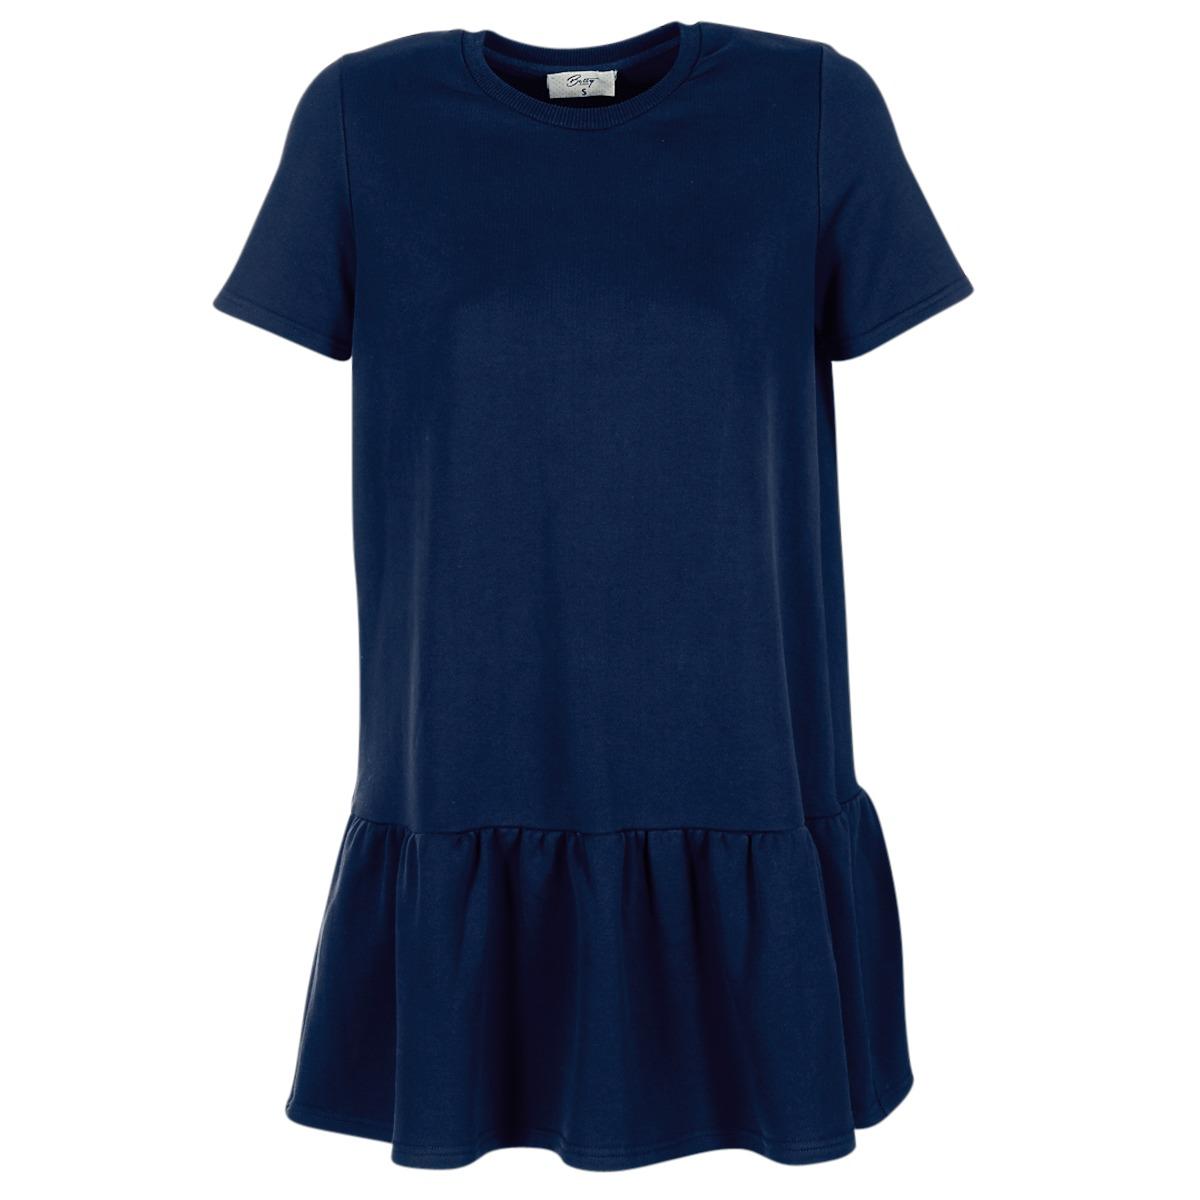 Betty London Kleid HOMA jetztbilligerkaufen